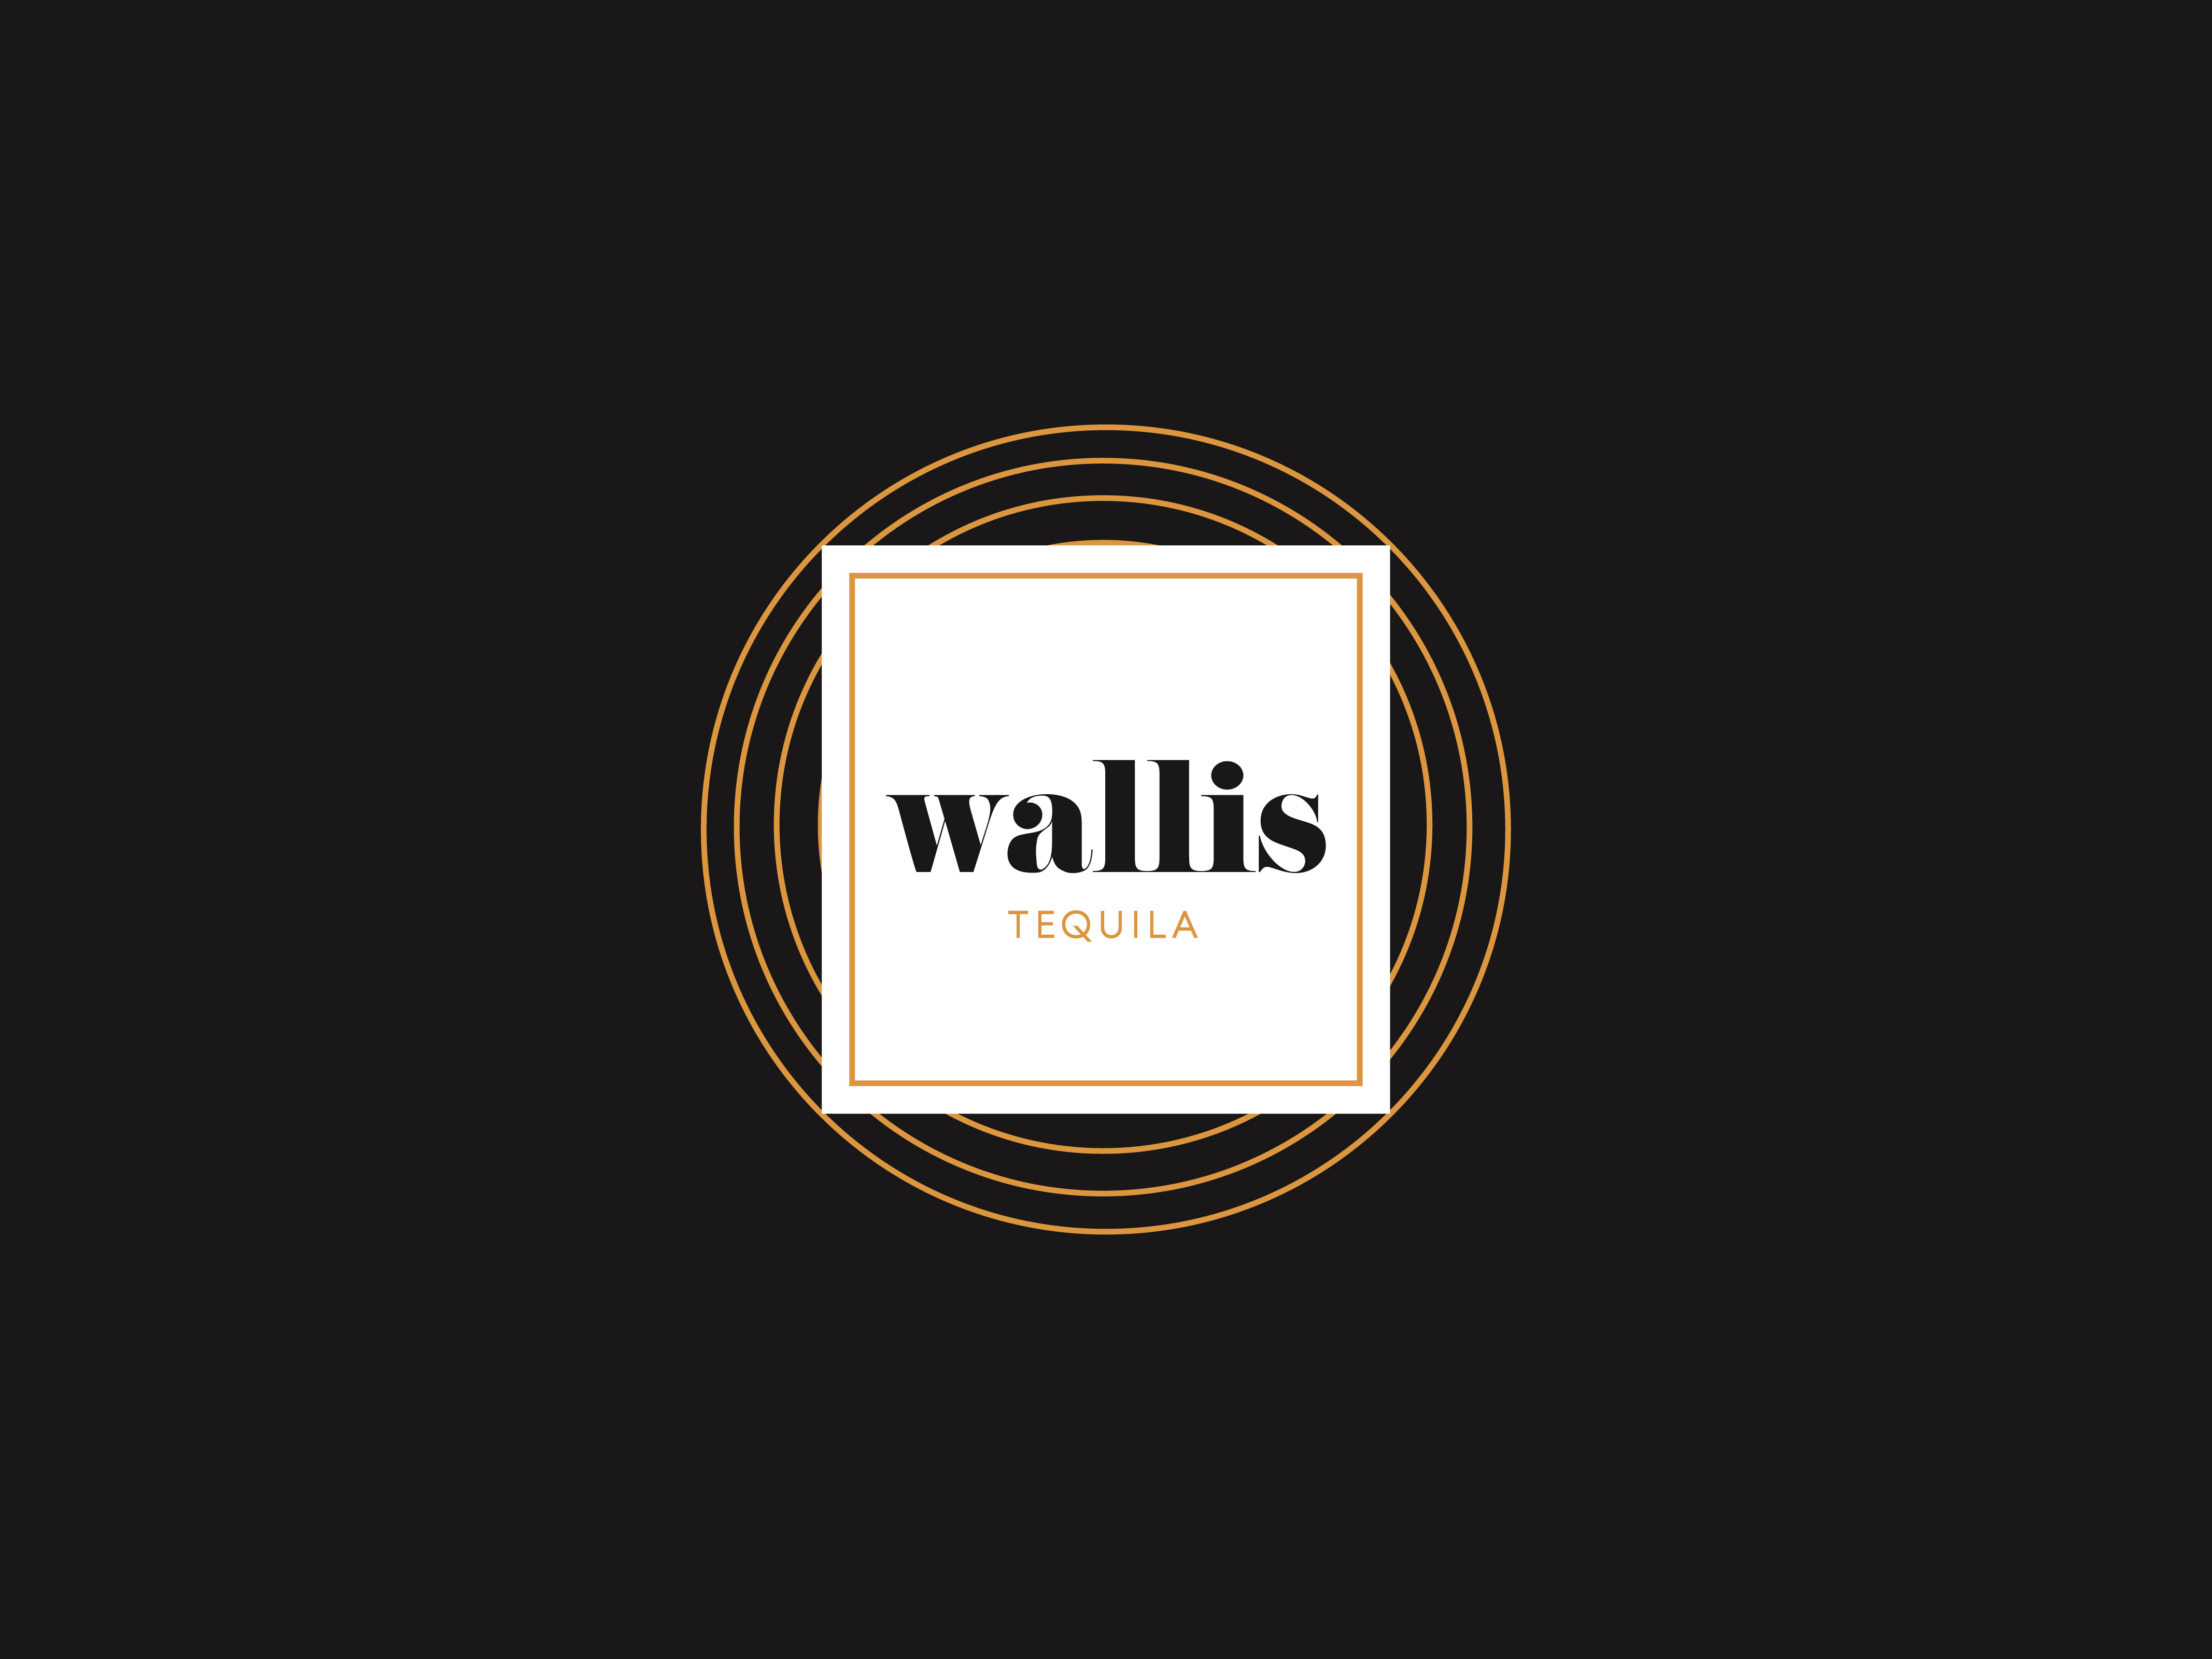 Wallis Tequila